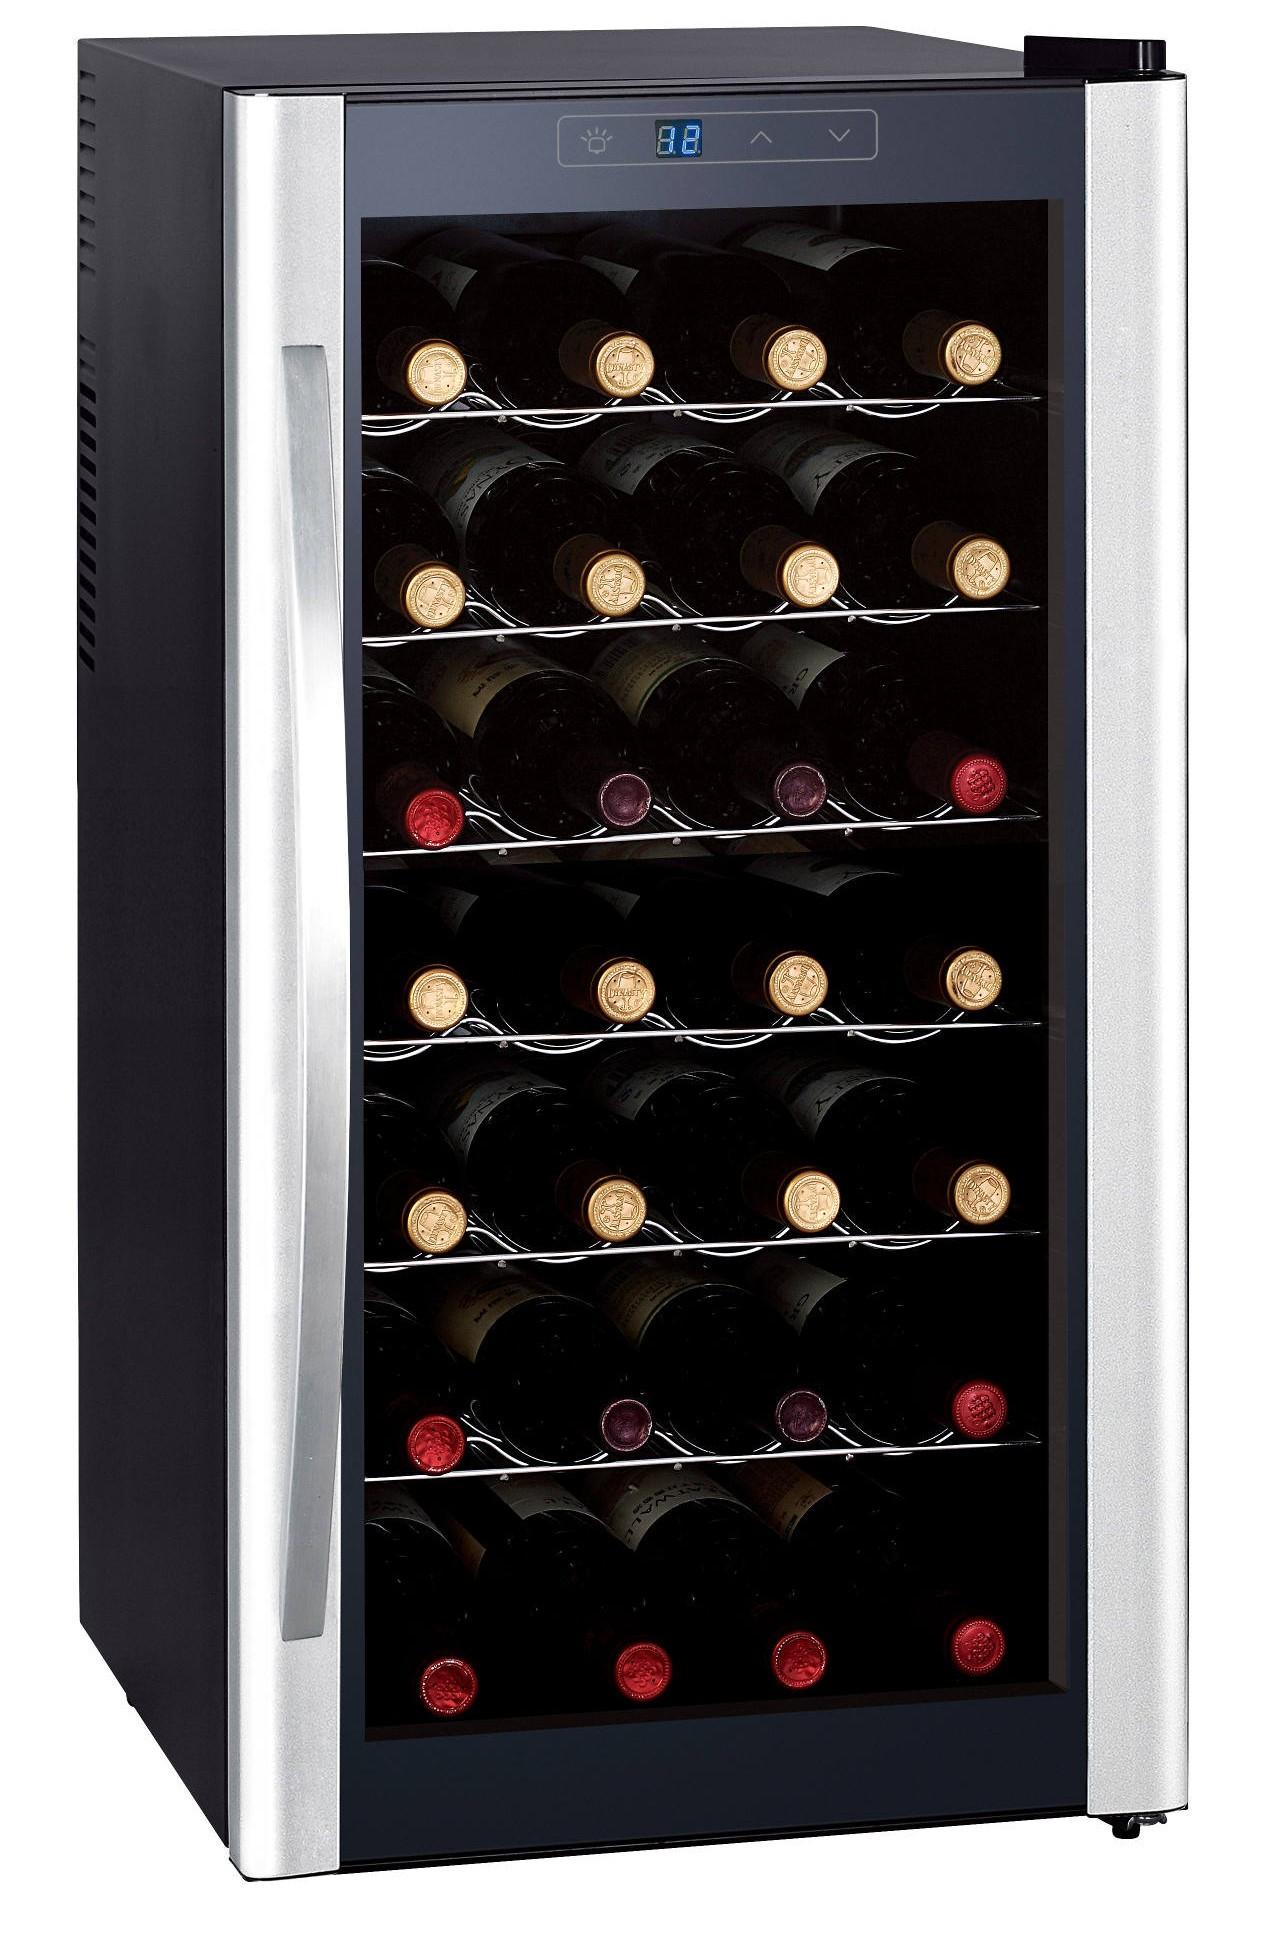 Vinoteca vinosphere vino 28k - Muebles para poner botellas de vino ...